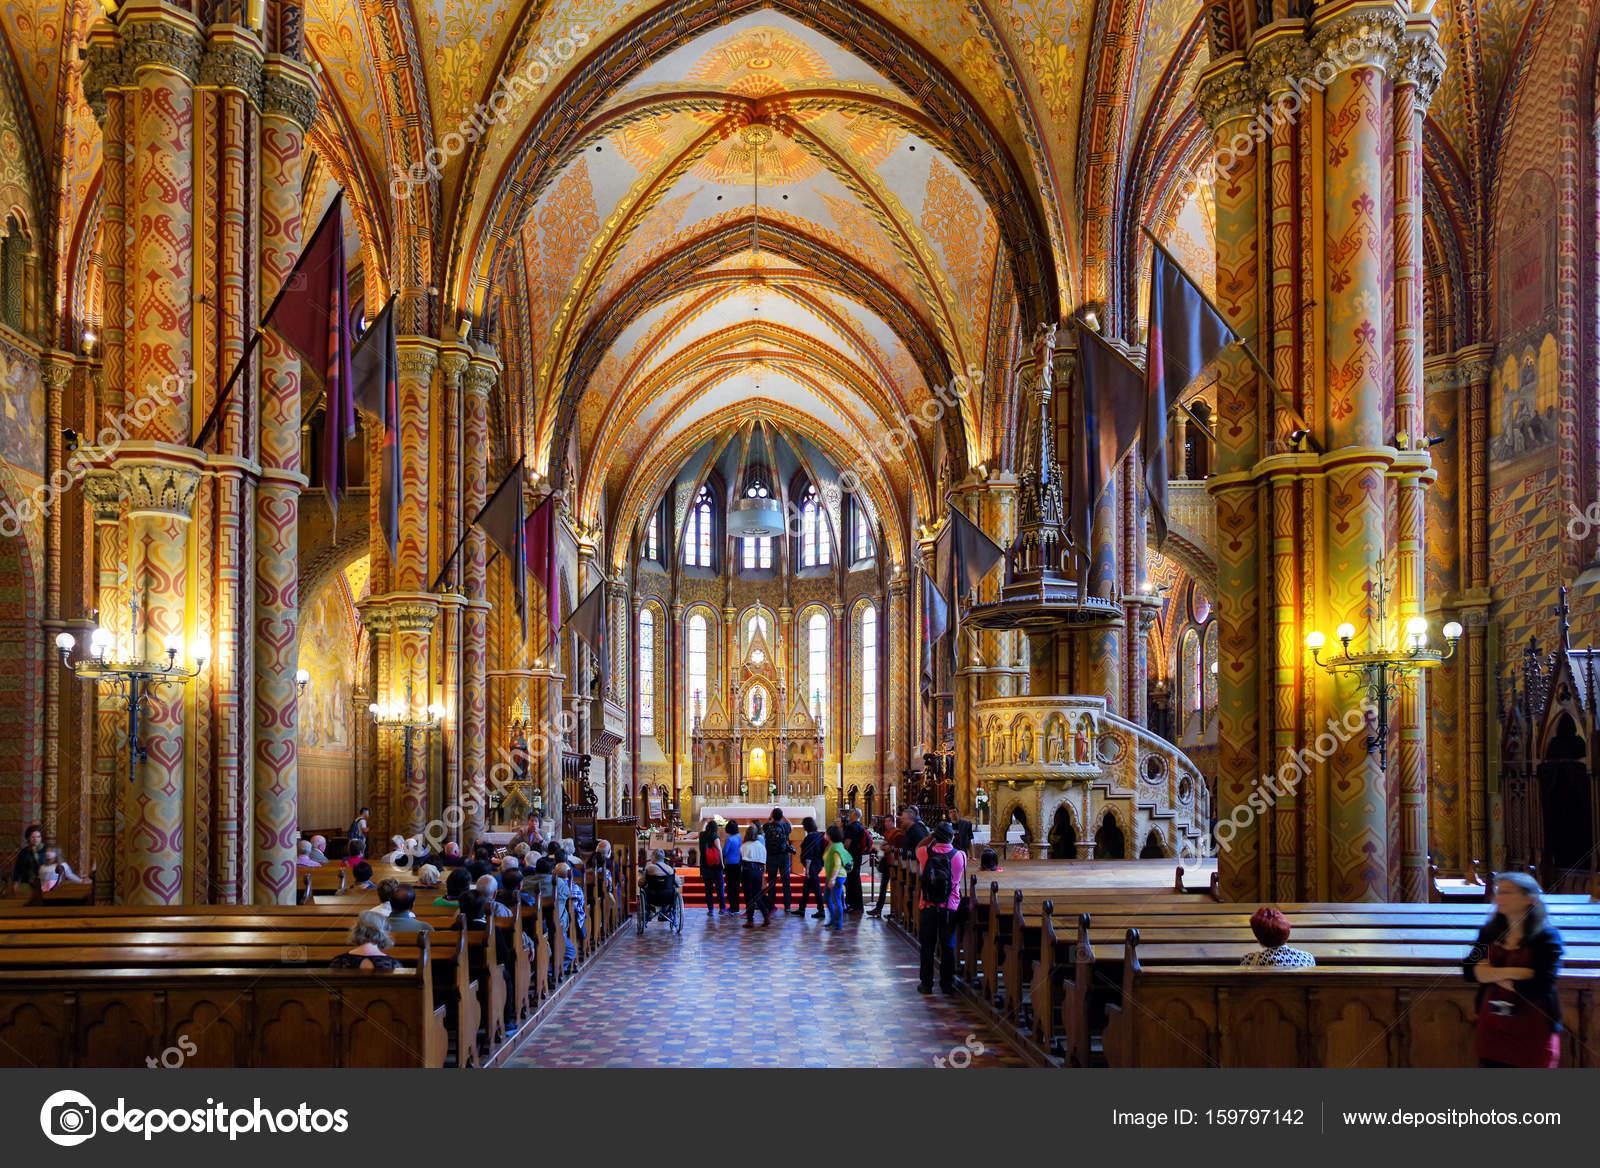 https://st3.depositphotos.com/1829921/15979/i/1600/depositphotos_159797142-stockafbeelding-interieur-van-matthias-kerk-in.jpg